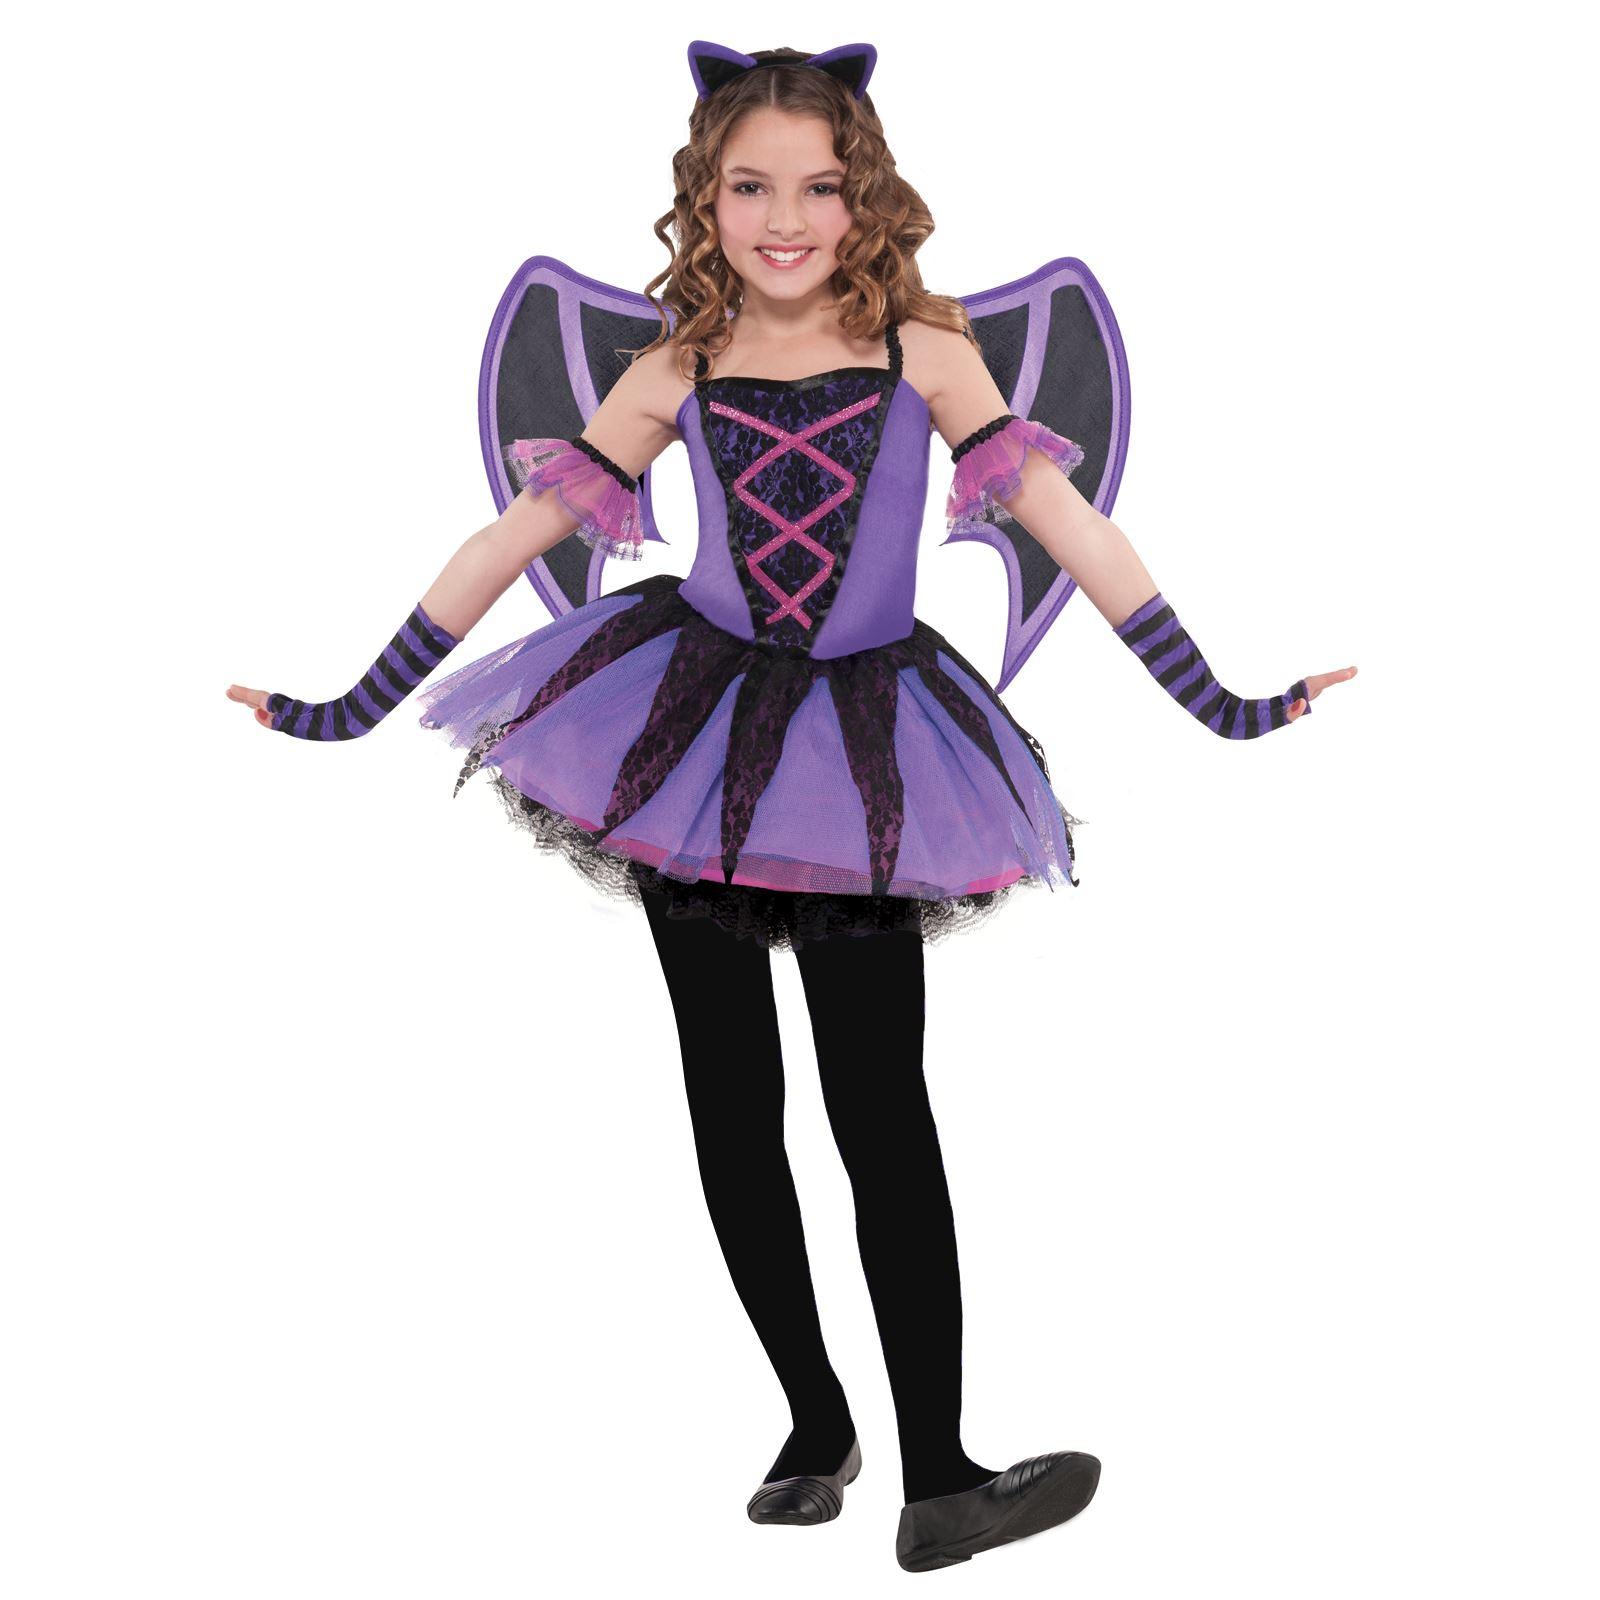 Boys Girls Fancy Dress Halloween Party Horror Costume Trick Treat ...